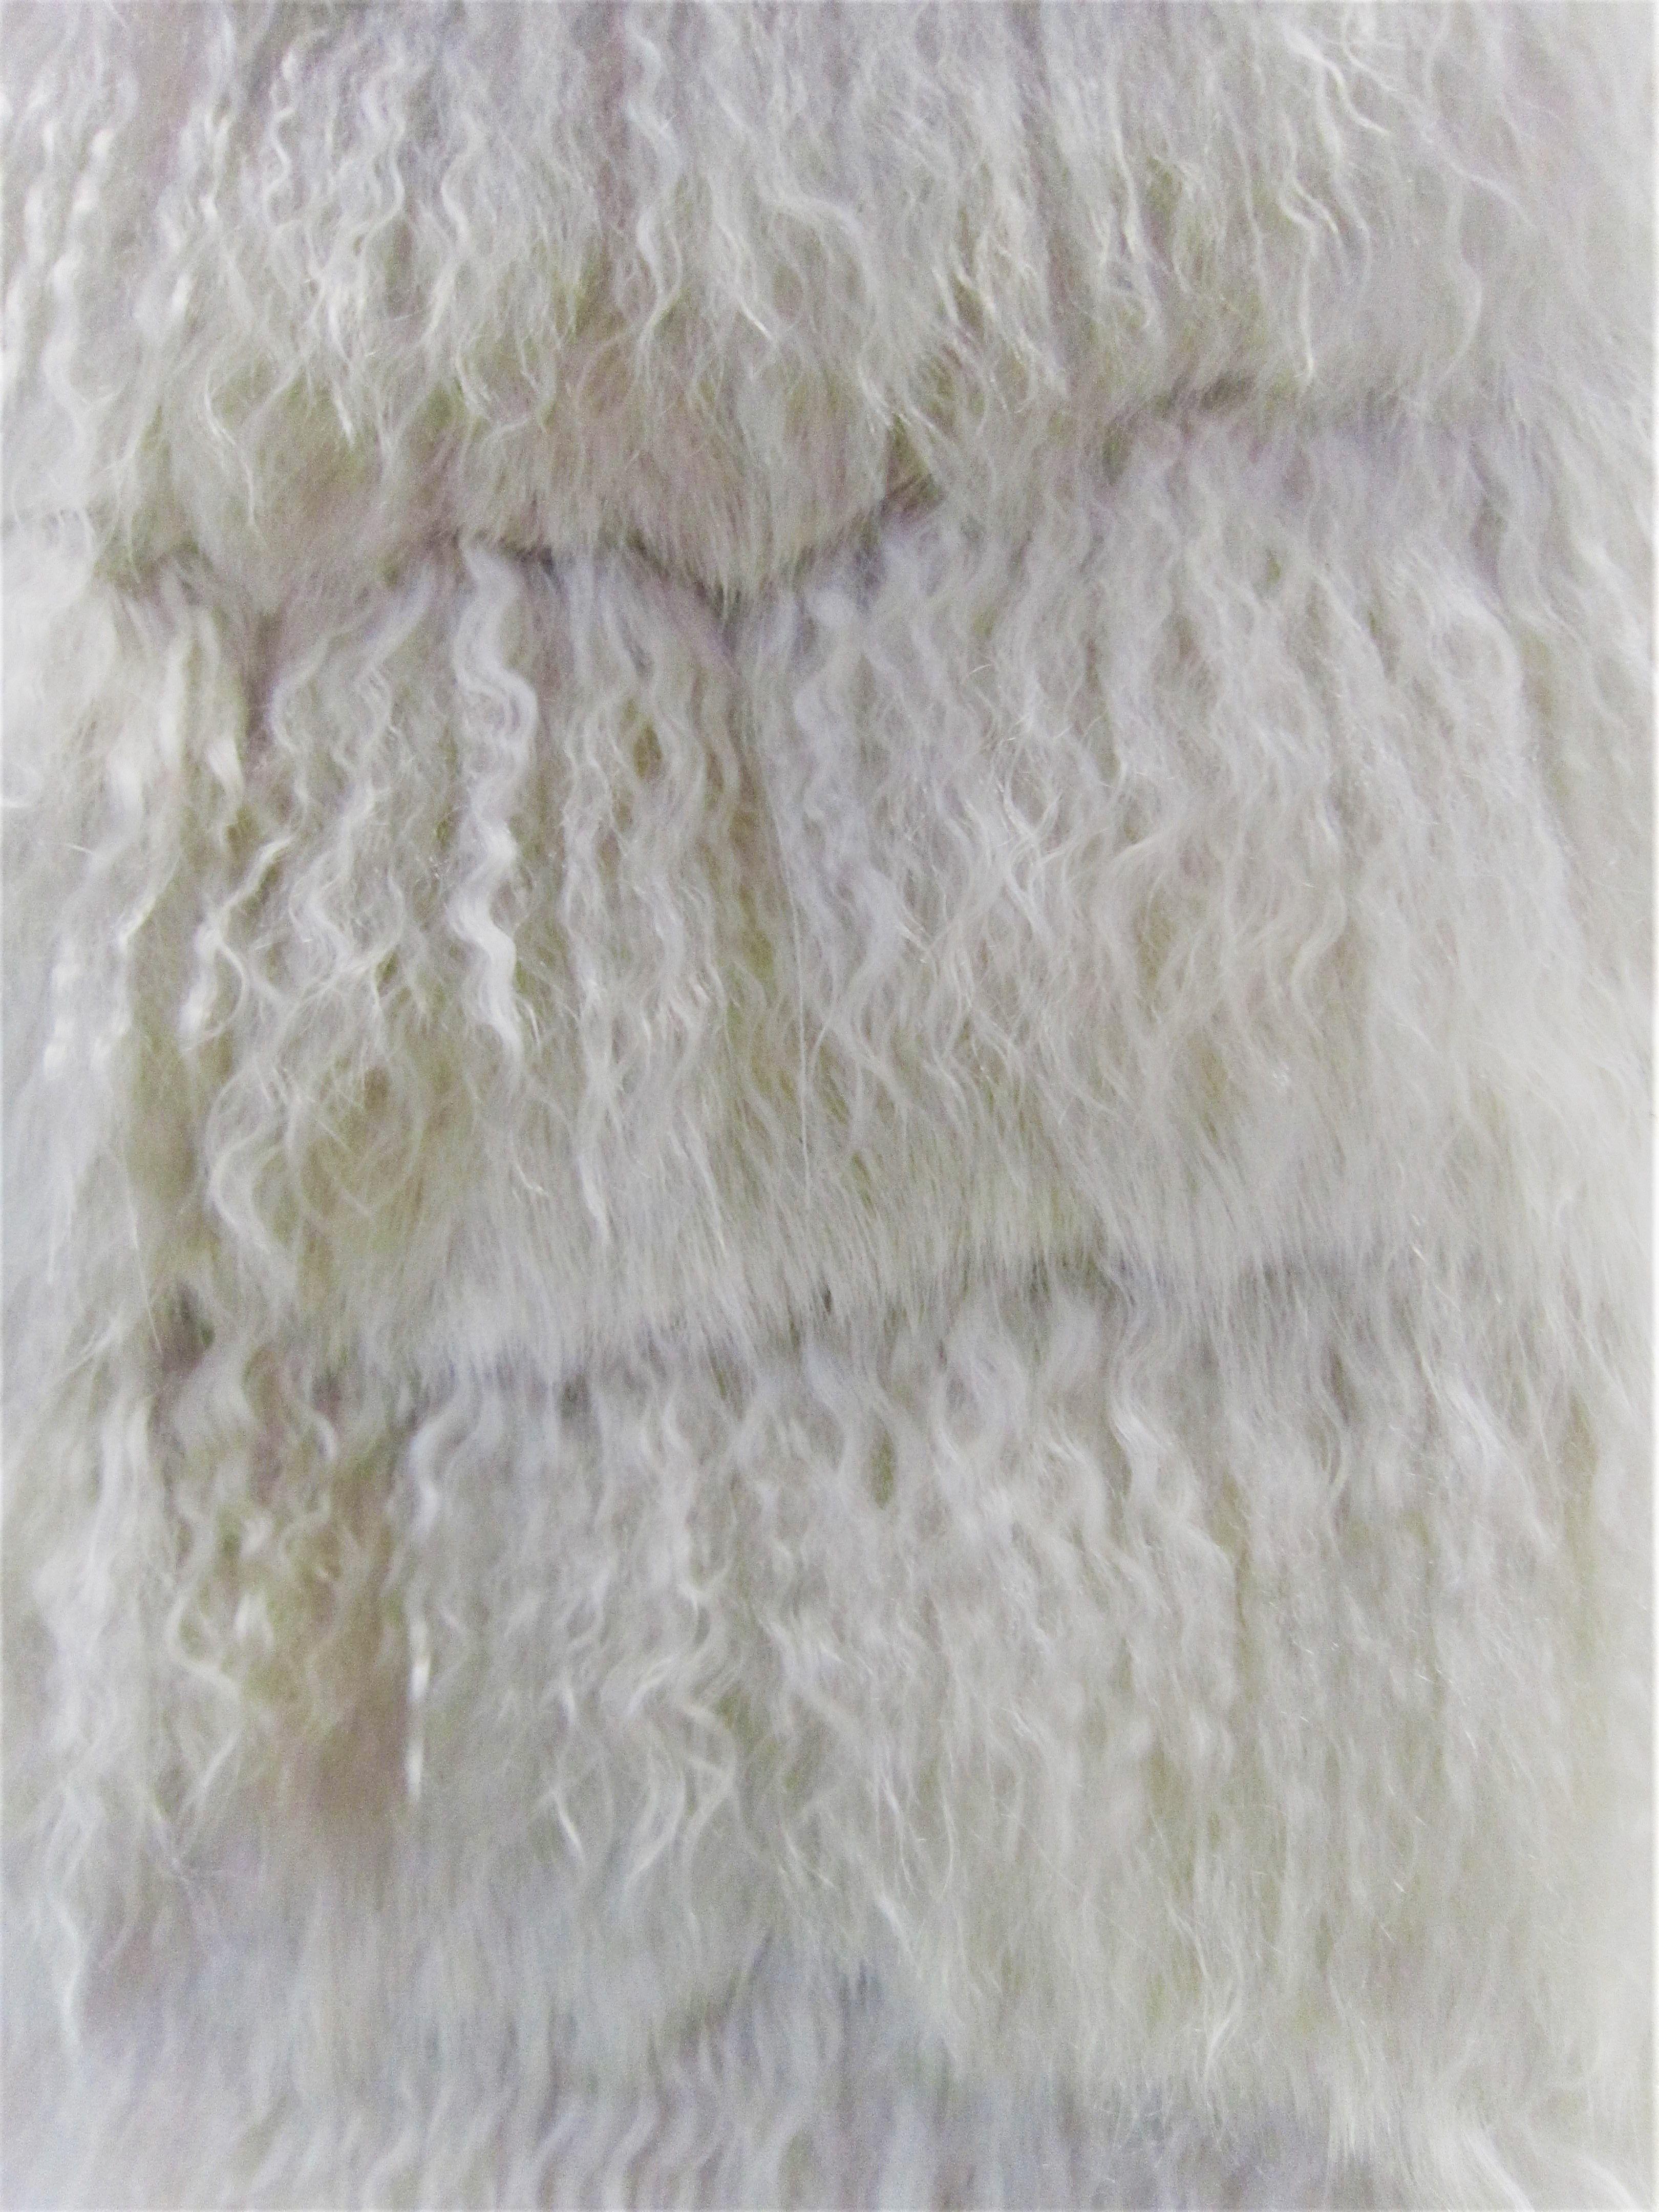 Ak europe | mongolian fur | white shades | fluffy | soft fur | winter cozy | furrery | italian style